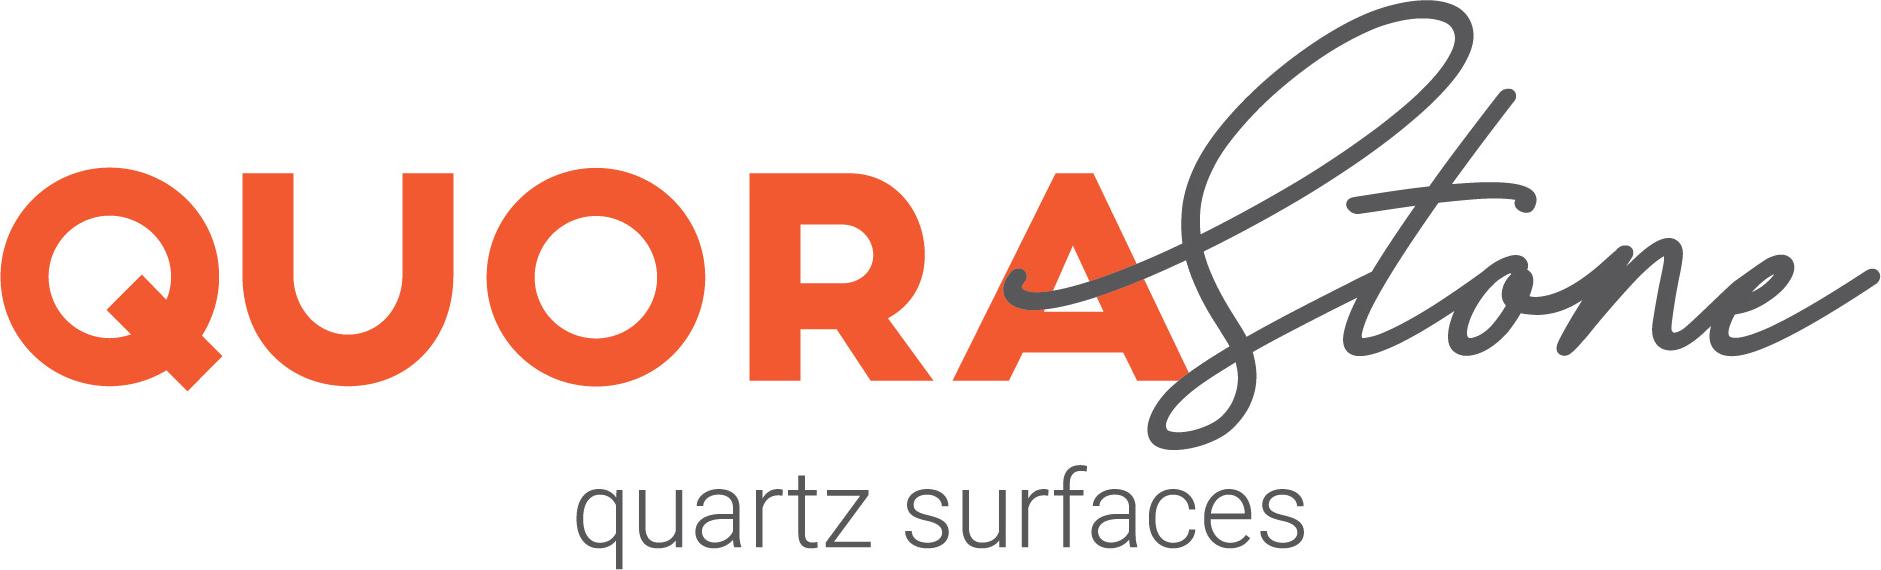 Quorastone